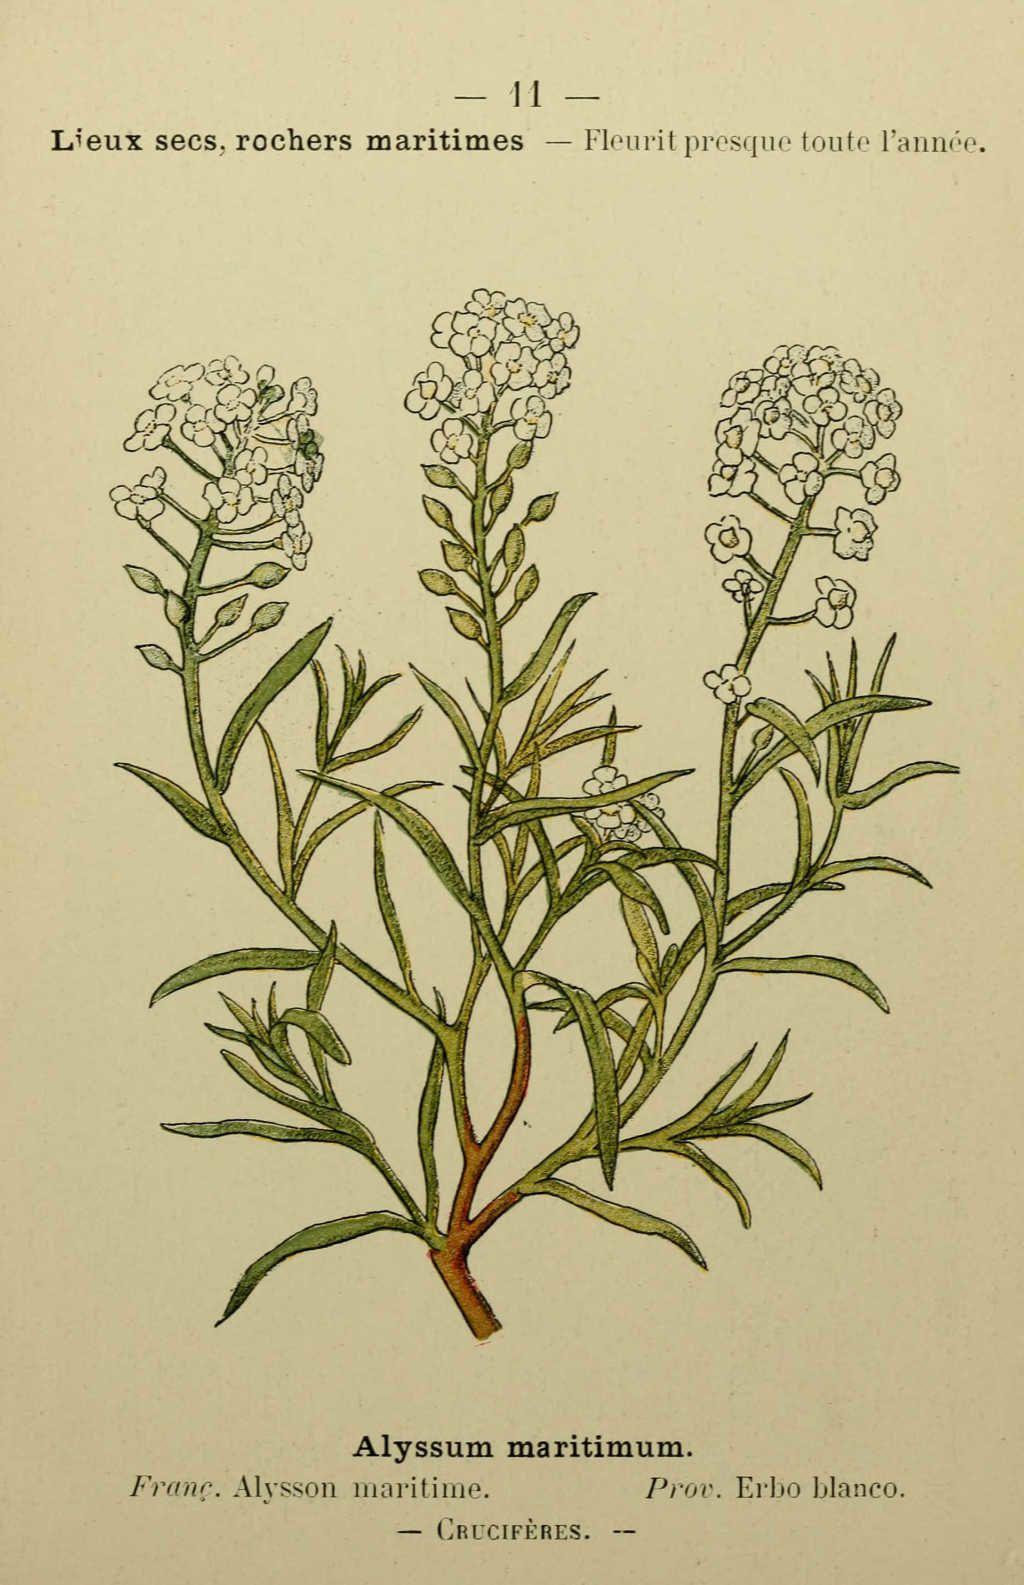 alysson maritime - alyssum maritimum - Dessin fleur Méditerranée